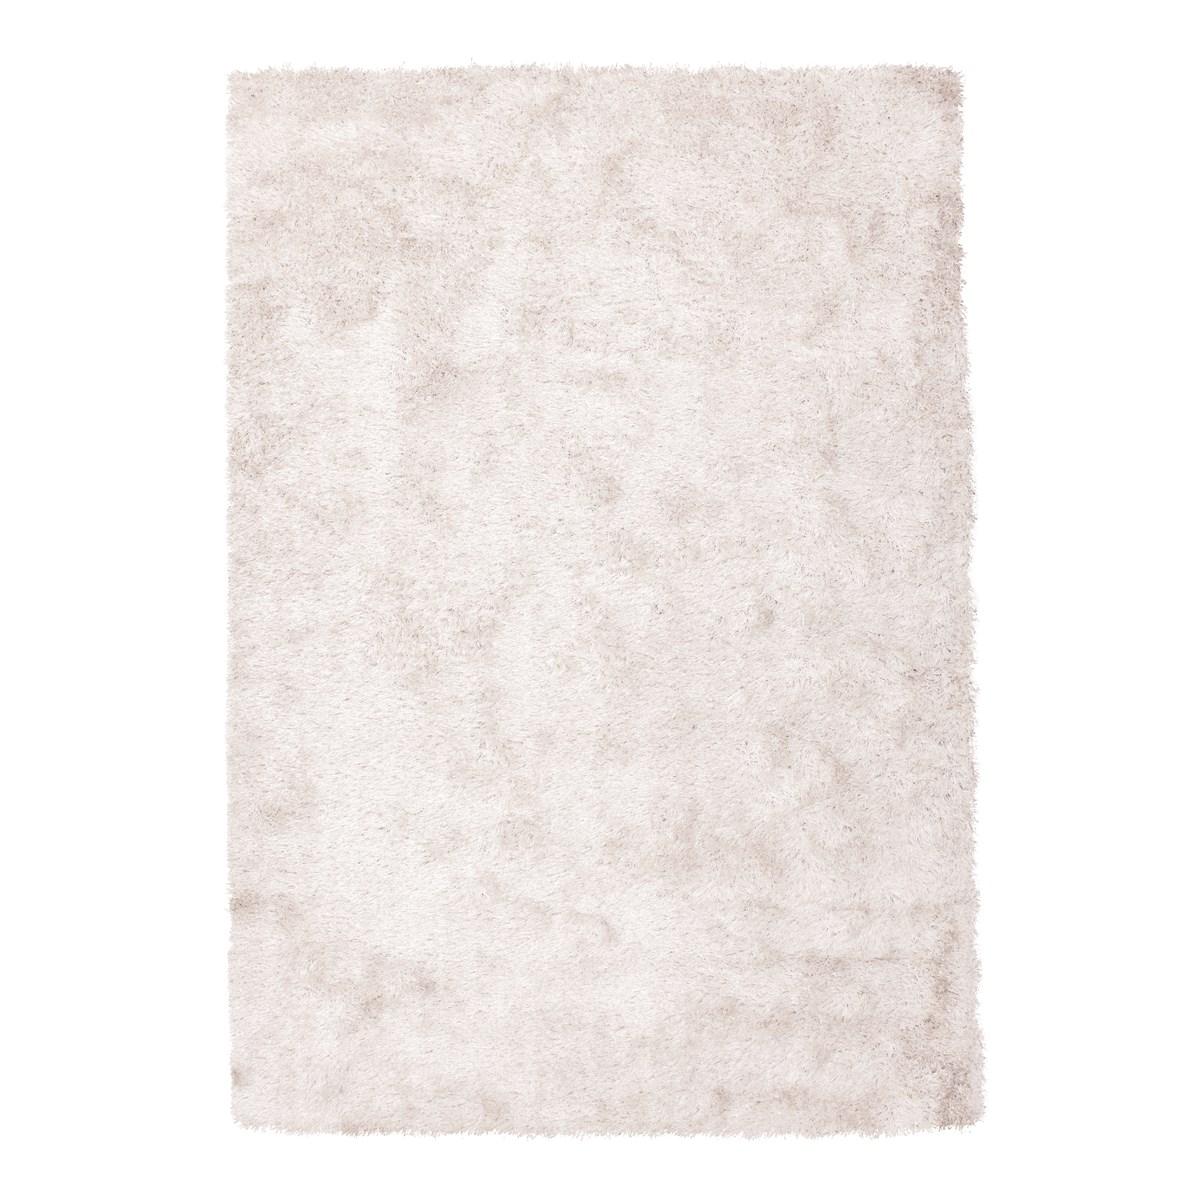 Tapis shaggy en Polyester Blanc cassé 80x150 cm